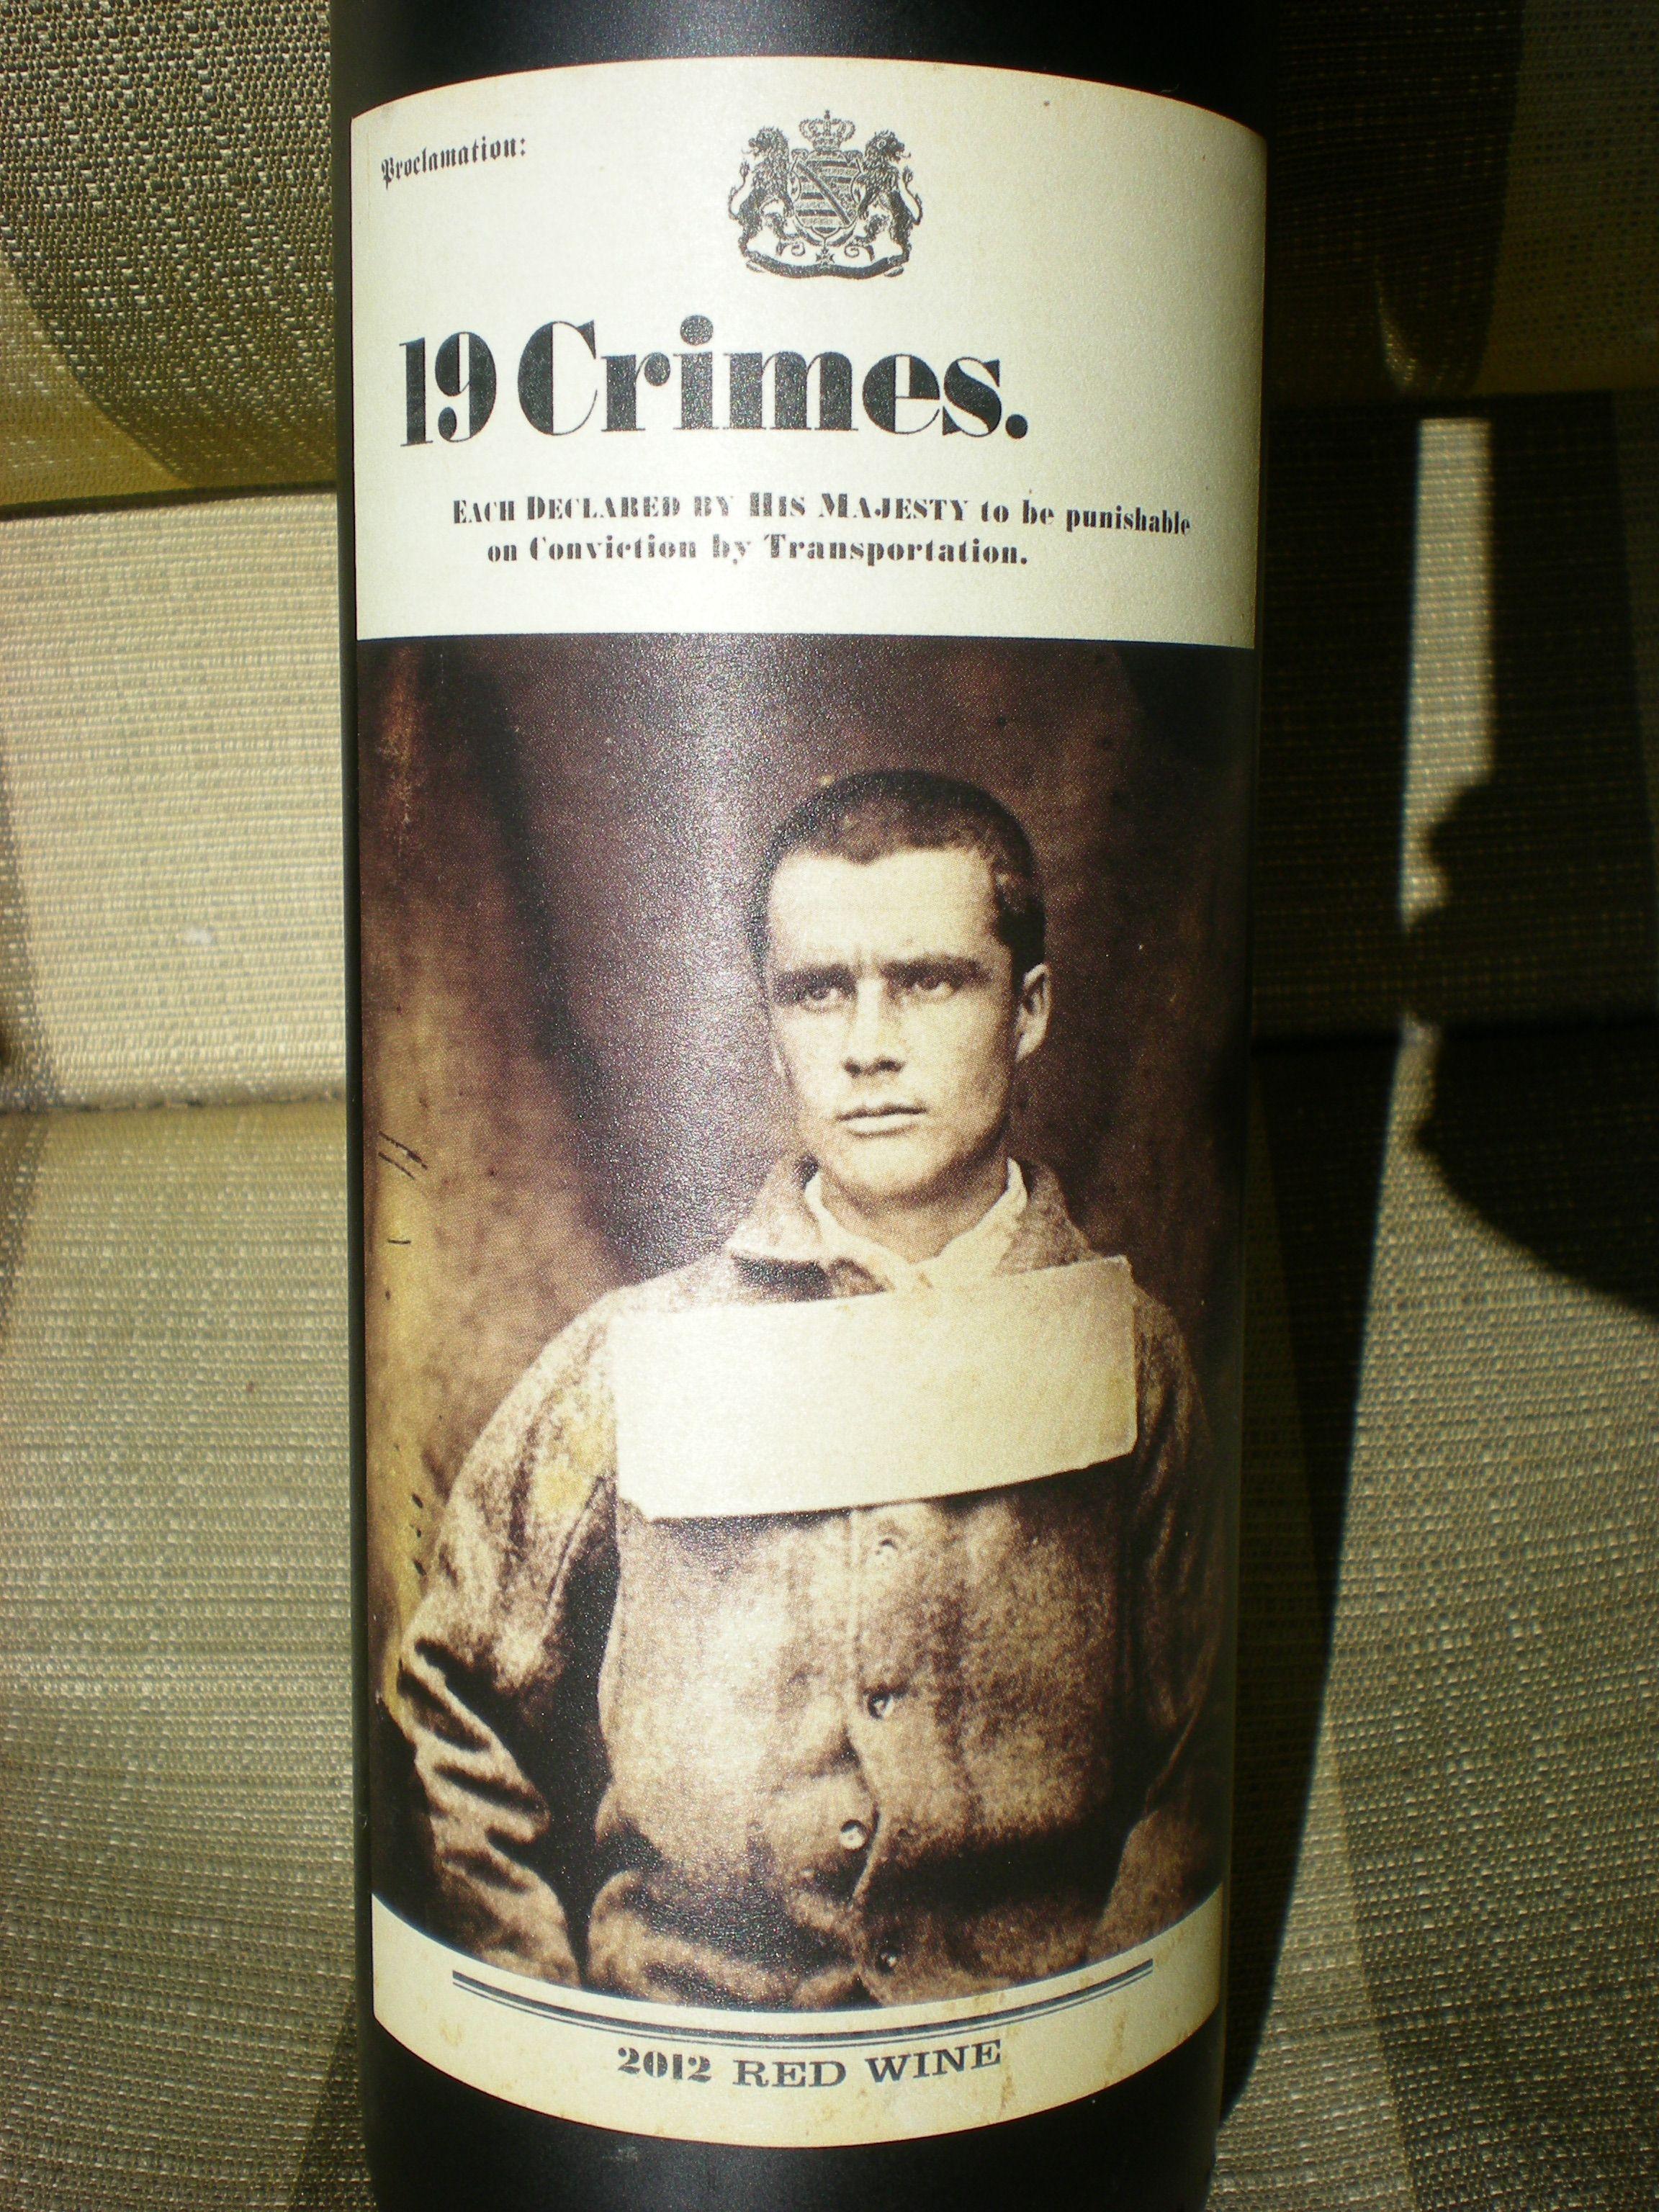 19 Crimes South Eastern Australia, Aus. Wine Labels